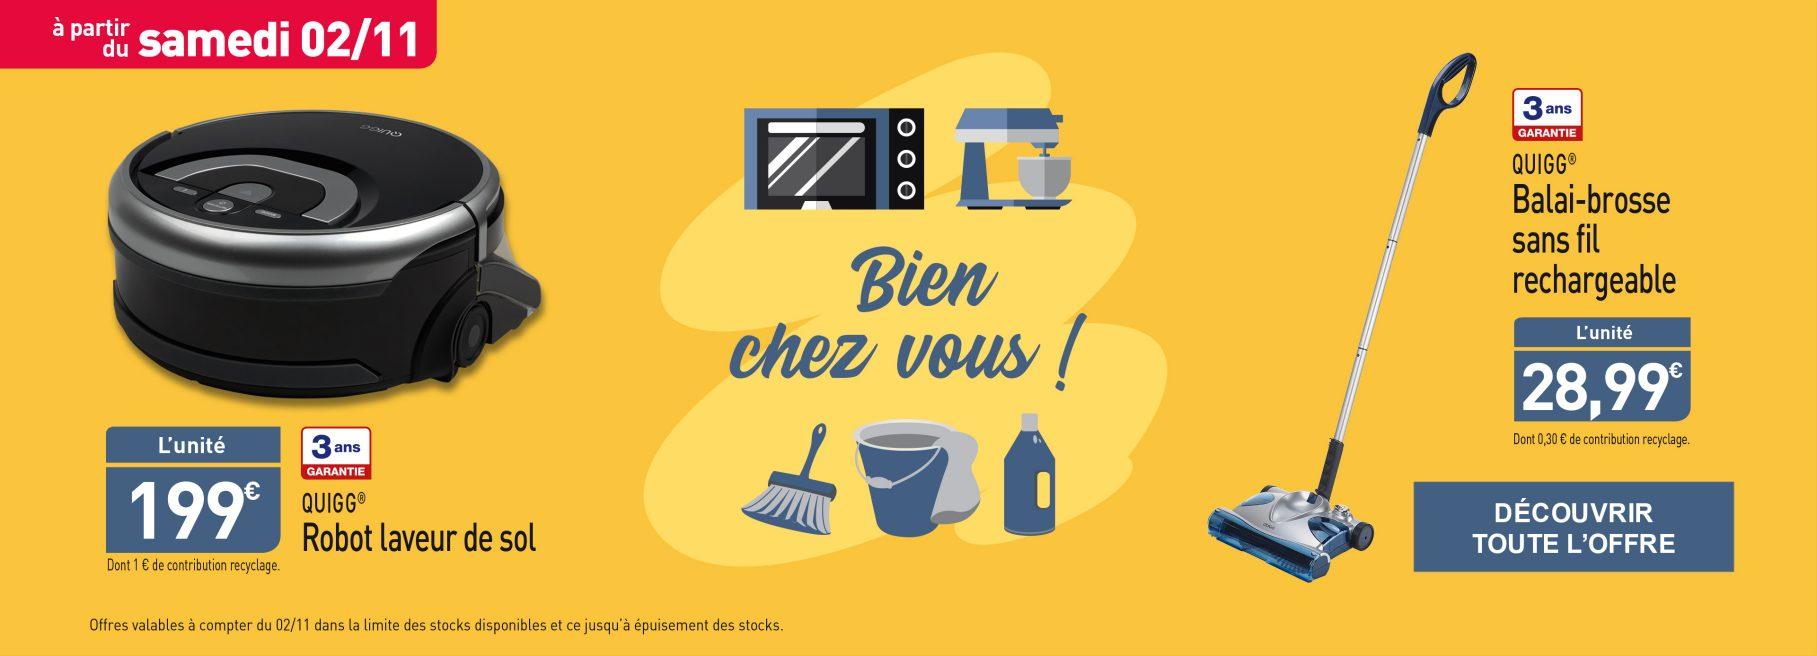 https://www.aldi.fr/content/dam/aldi/france/products/operation/2019/s44-2019/bannieres/S44-SAMEDI_MAISON-slider-3840x1387px.jpg/jcr:content/renditions/original.transform/1817w/img.1571412837630.jpg